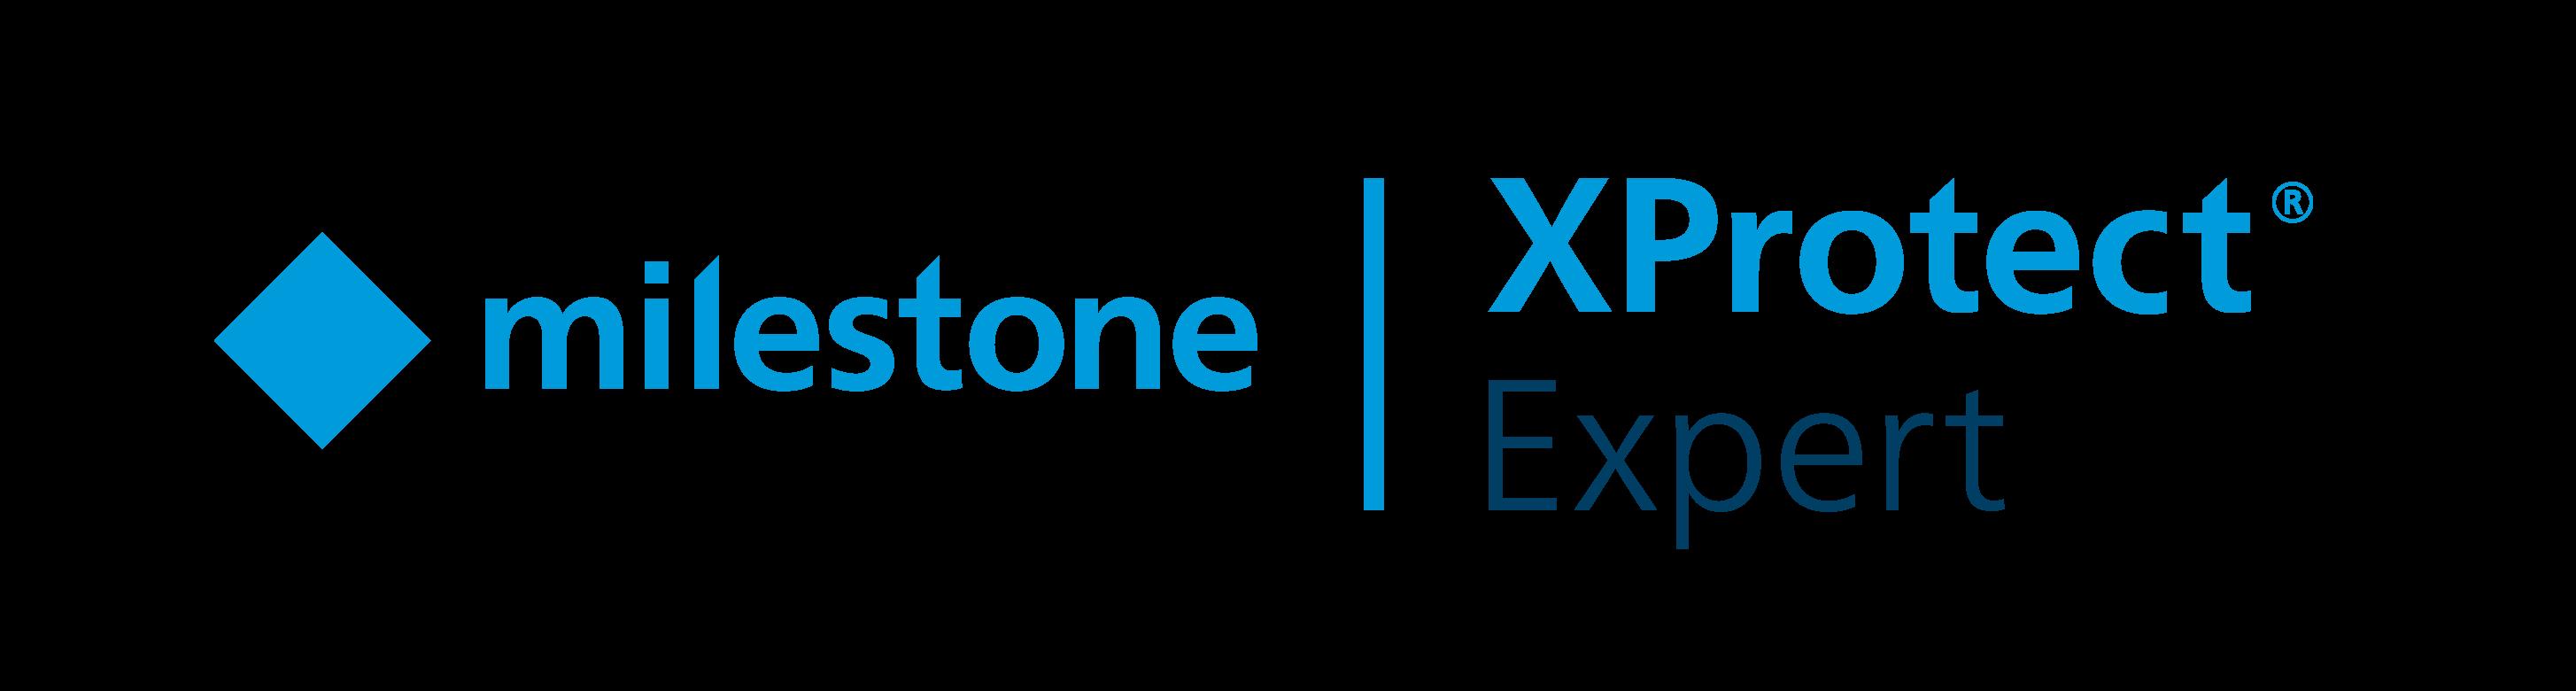 Milestone Drie jaar Care Plus voor XProtect Expert Base licentie